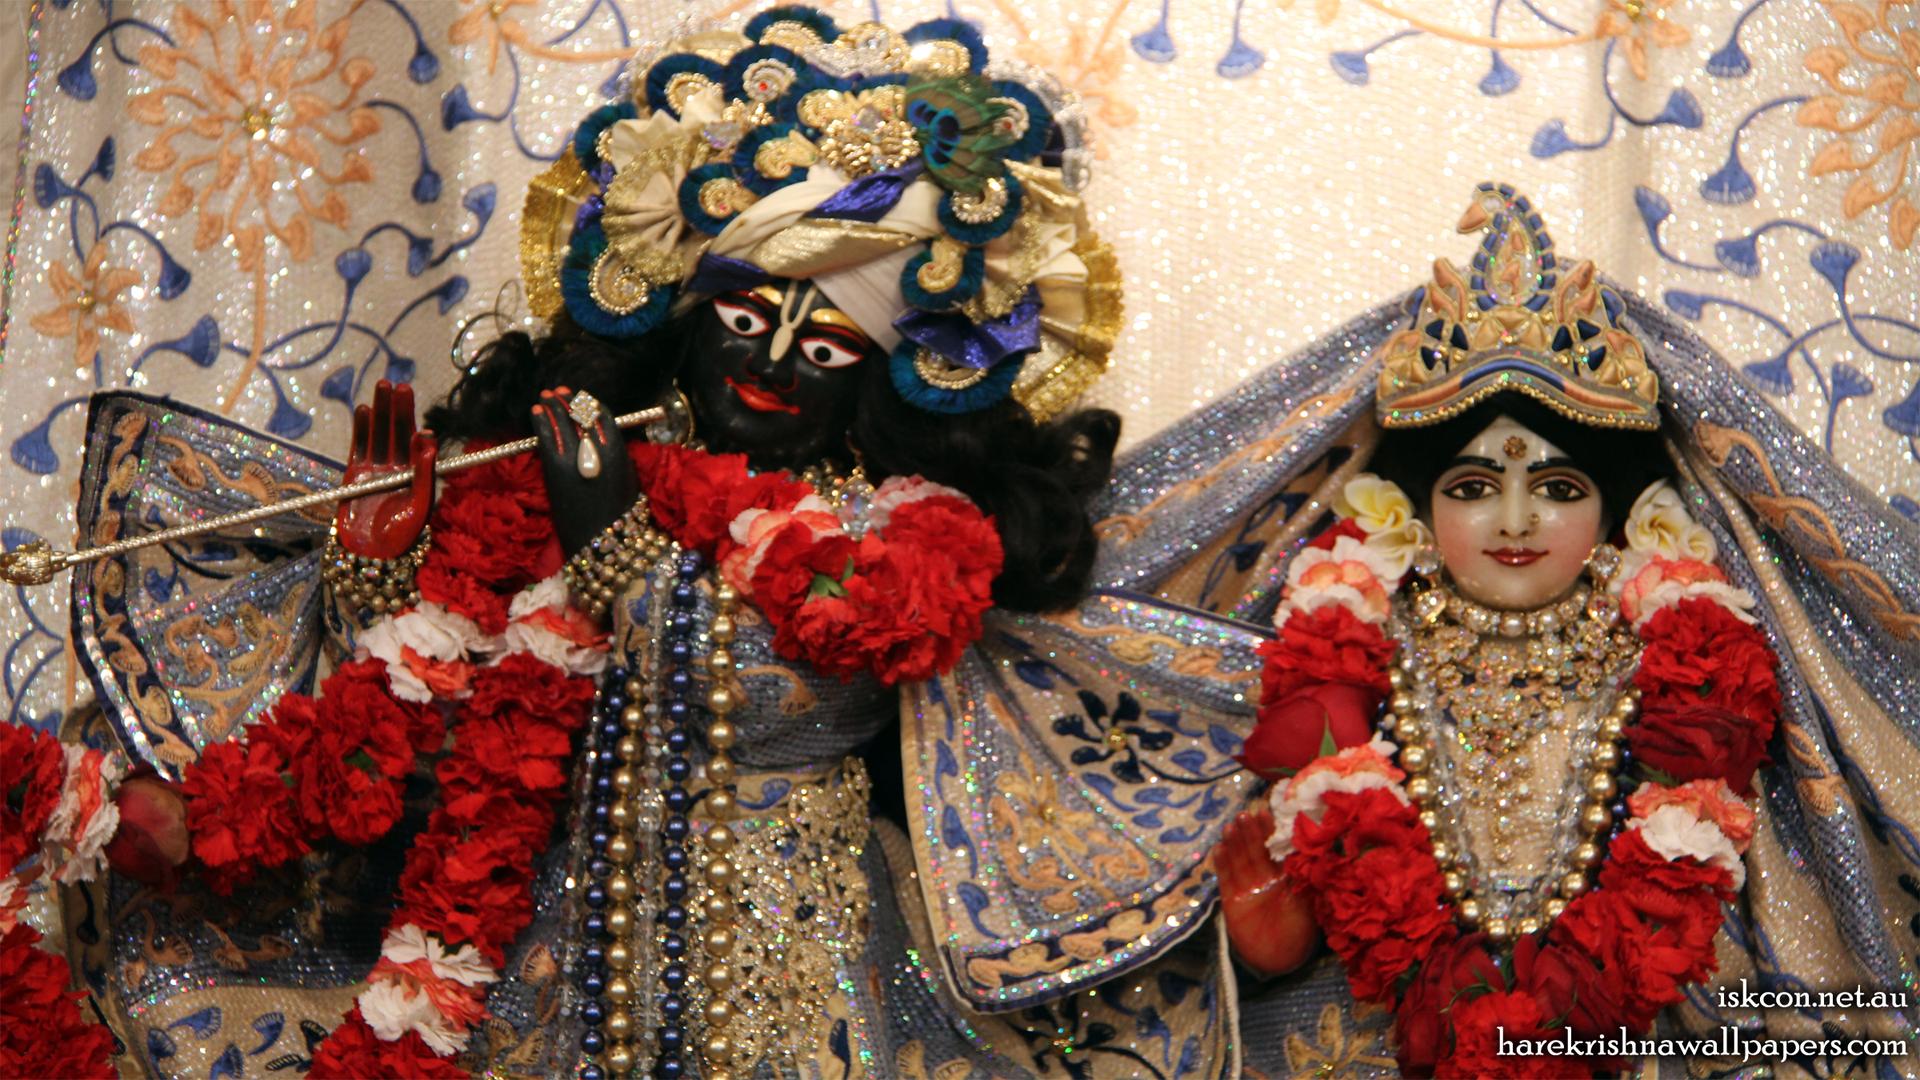 Sri Sri Radha Vallabh Close up Wallpaper (002) Size 1920x1080 Download